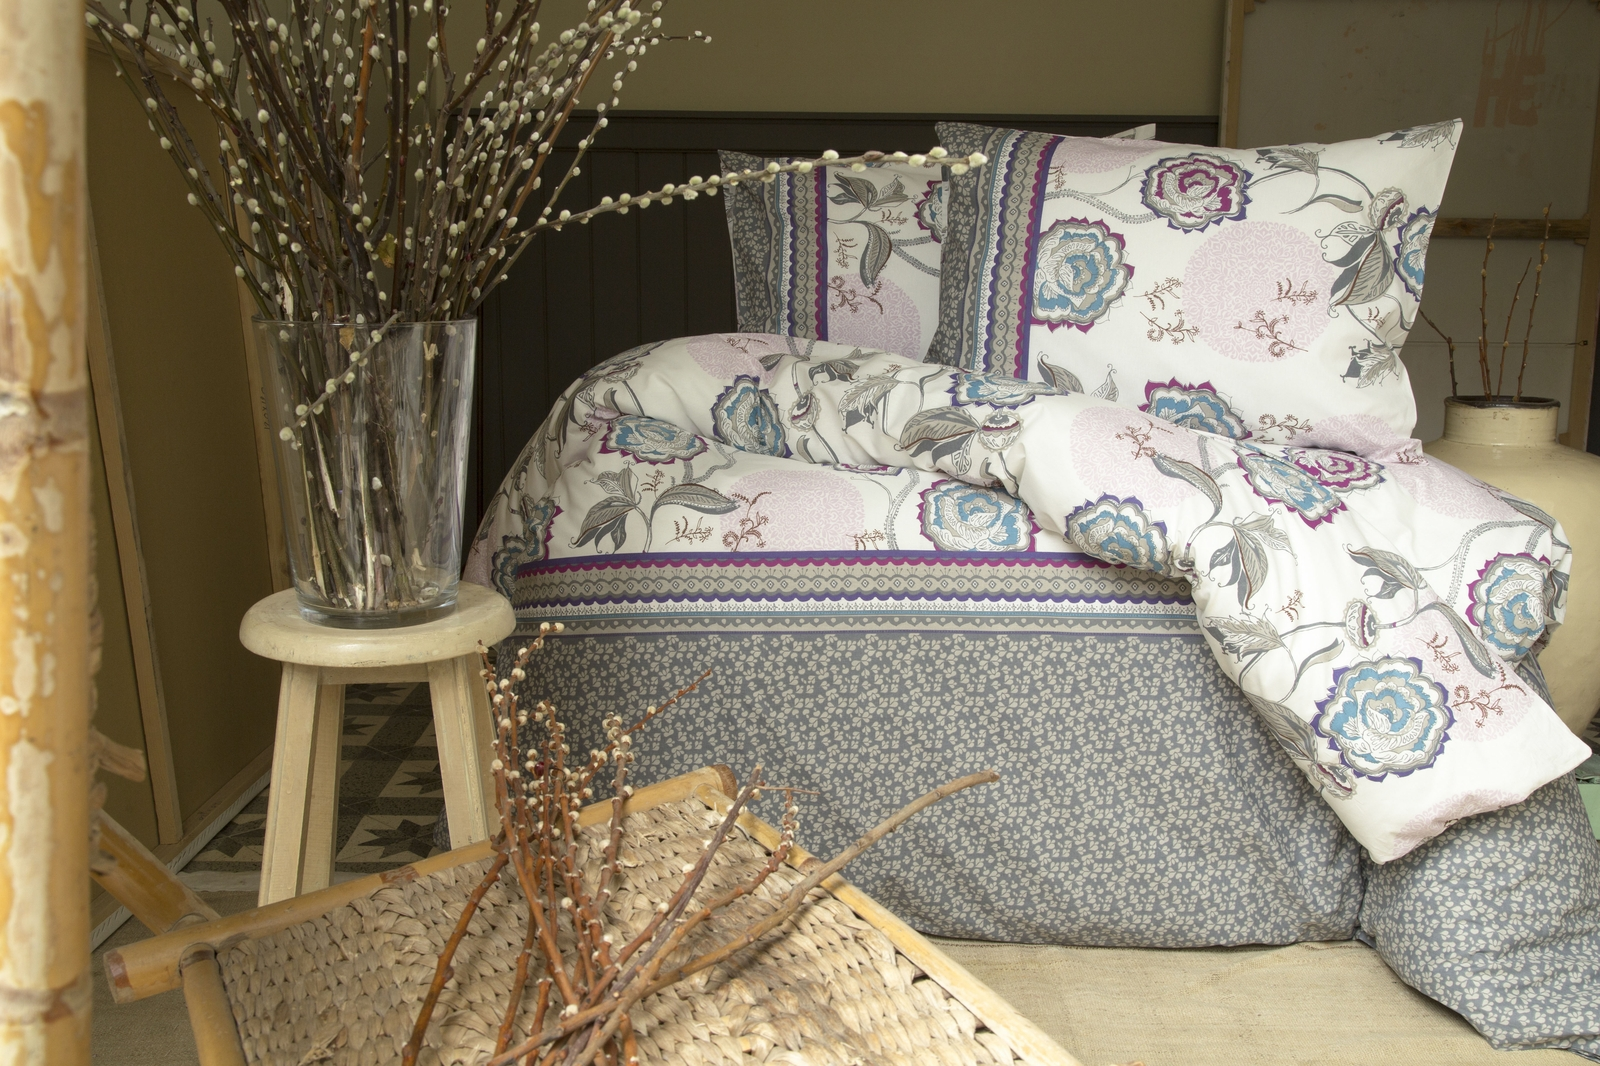 цена на Комплект белья Issimo Home Farin, 1,5-спальный, наволочки 50x70, цвет: бежевый